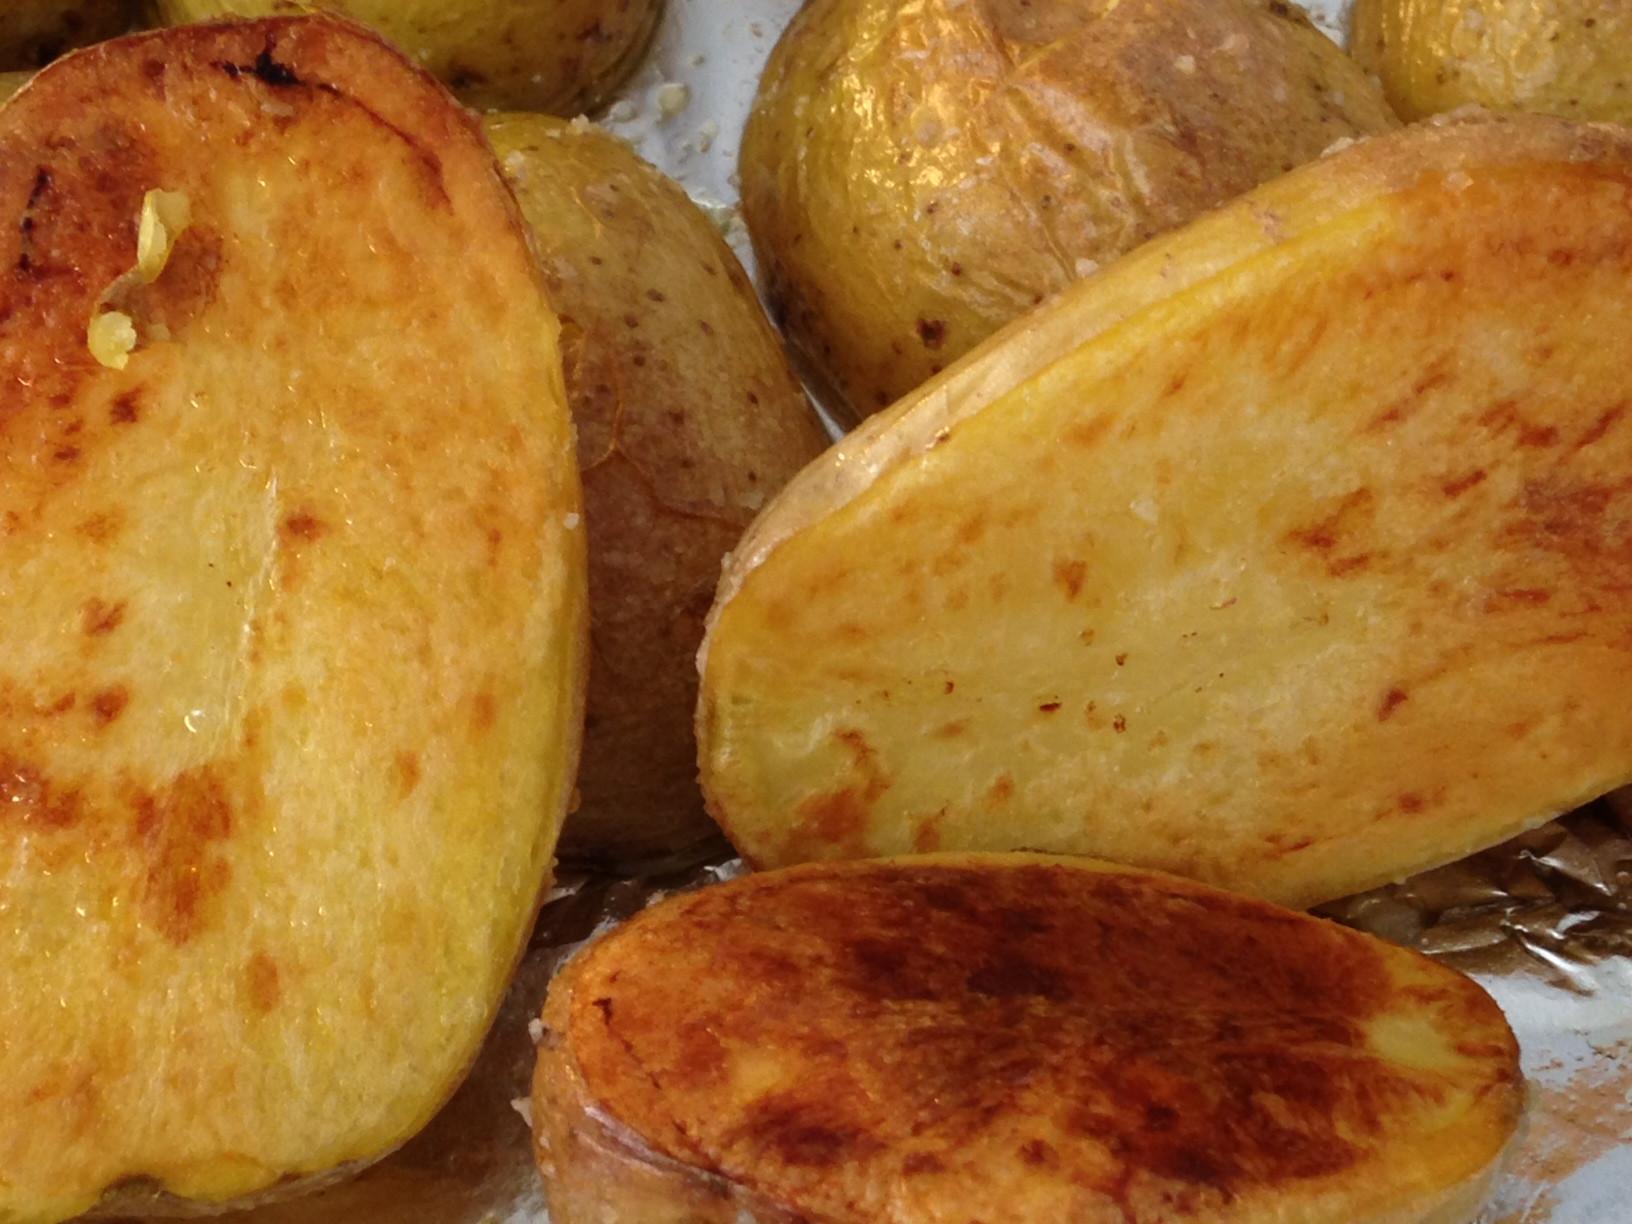 Roasted Yukon Gold Potatoes  How To Make Roasted Yukon Gold Potatoes Living Trader